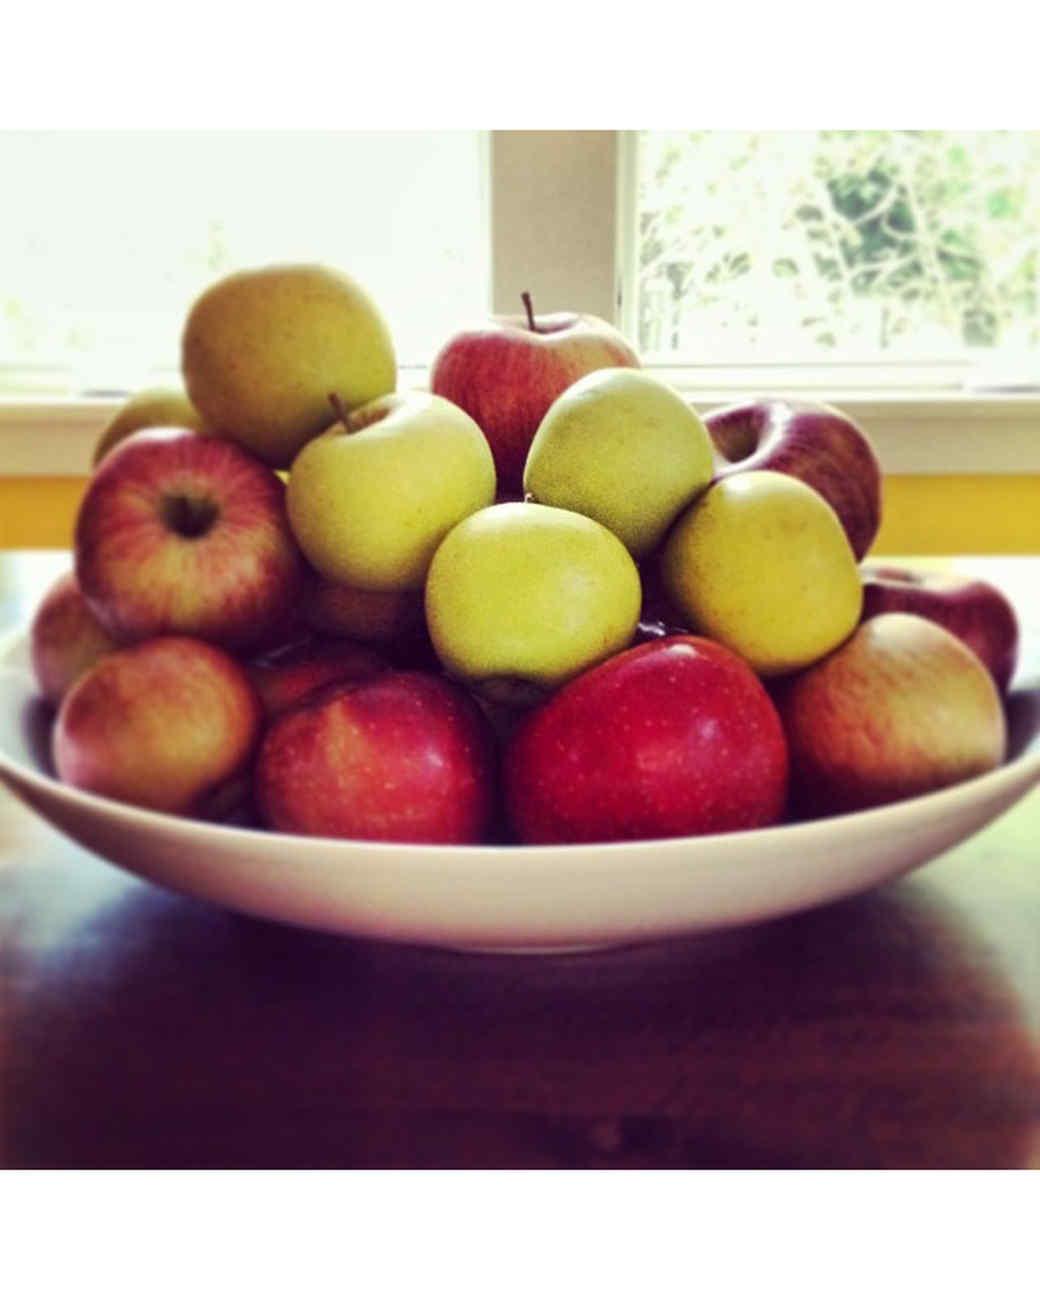 halloween-hunt-ugc-apples-jencardc.jpg